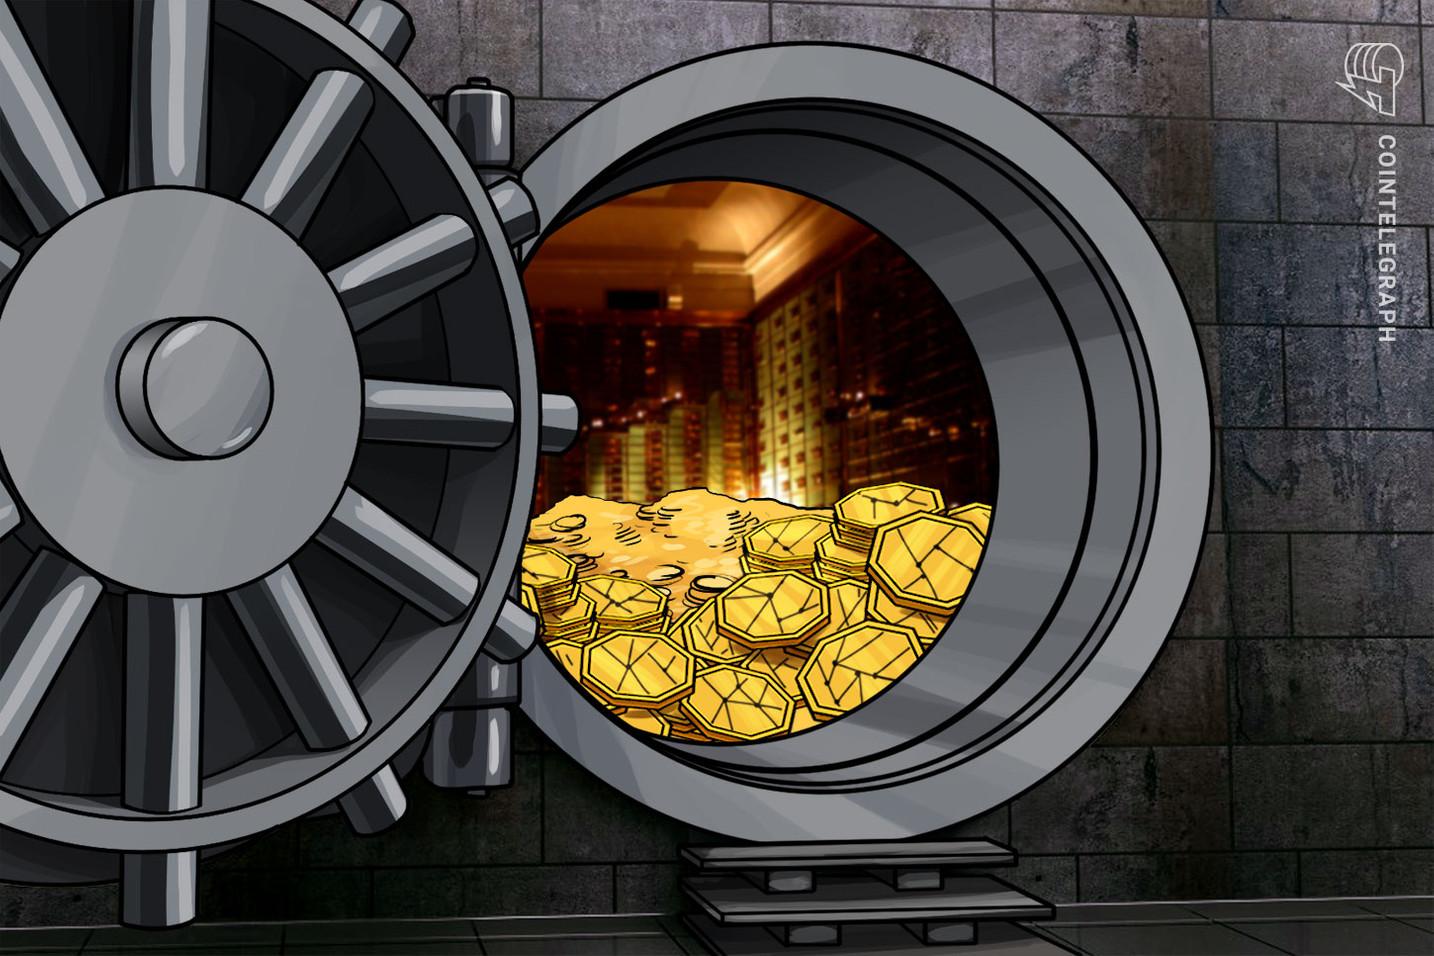 Goldman Sachs and Galaxy Digital's Mike Novogratz Invest $15 Million in Crypto Custody Firm